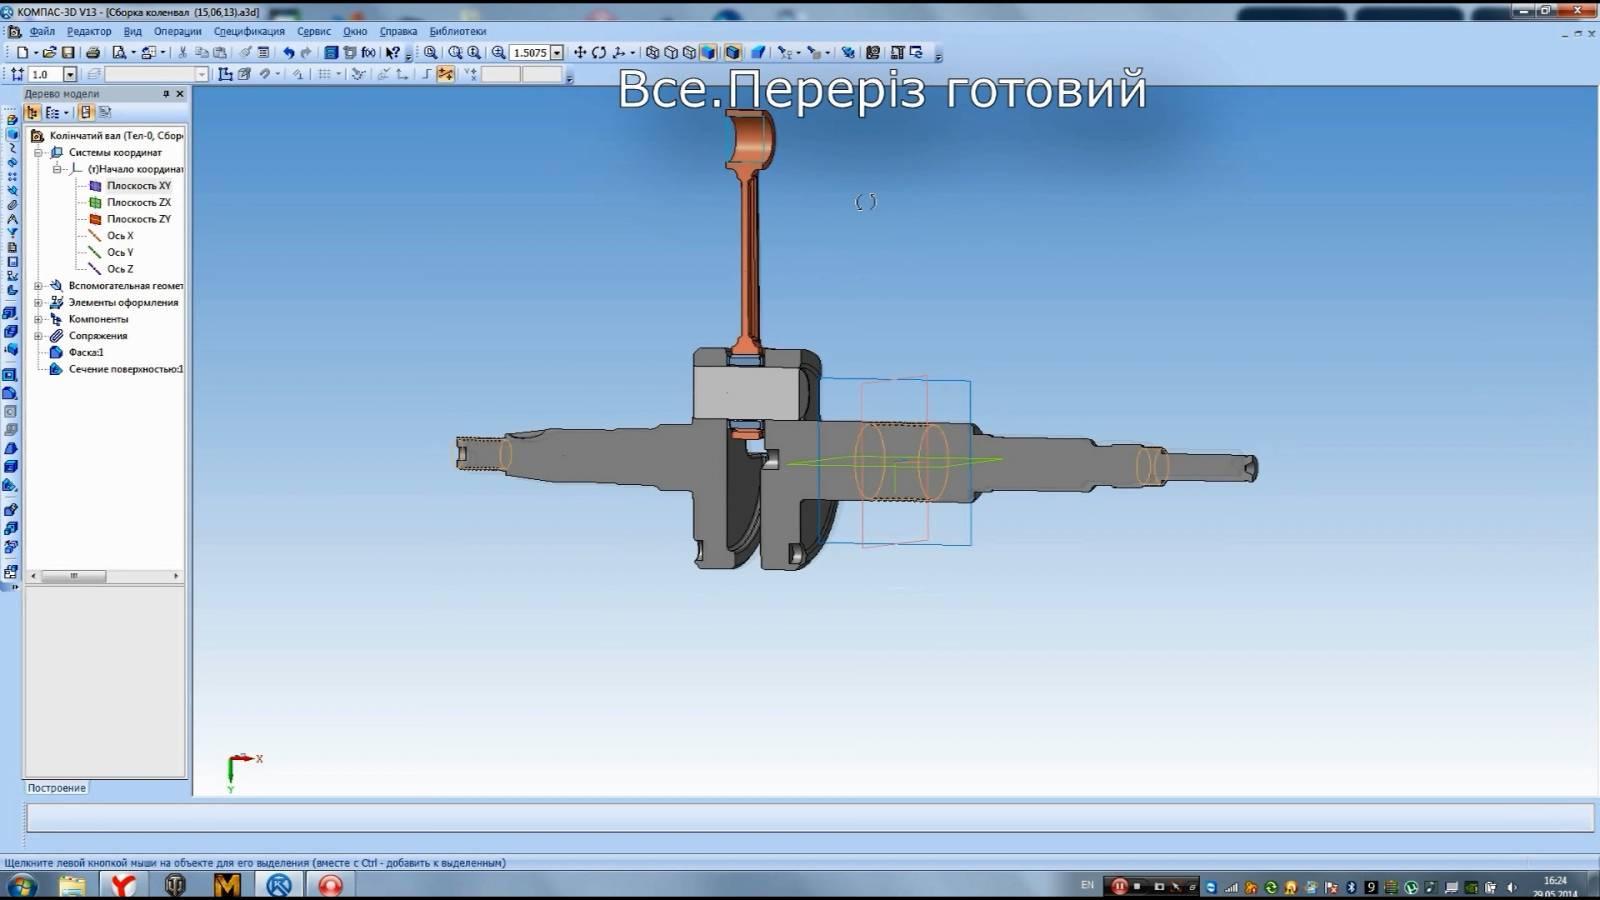 Компас 3D - Компас 3D - Фотоальбоми - Чертежи на заказ в Компас 3D